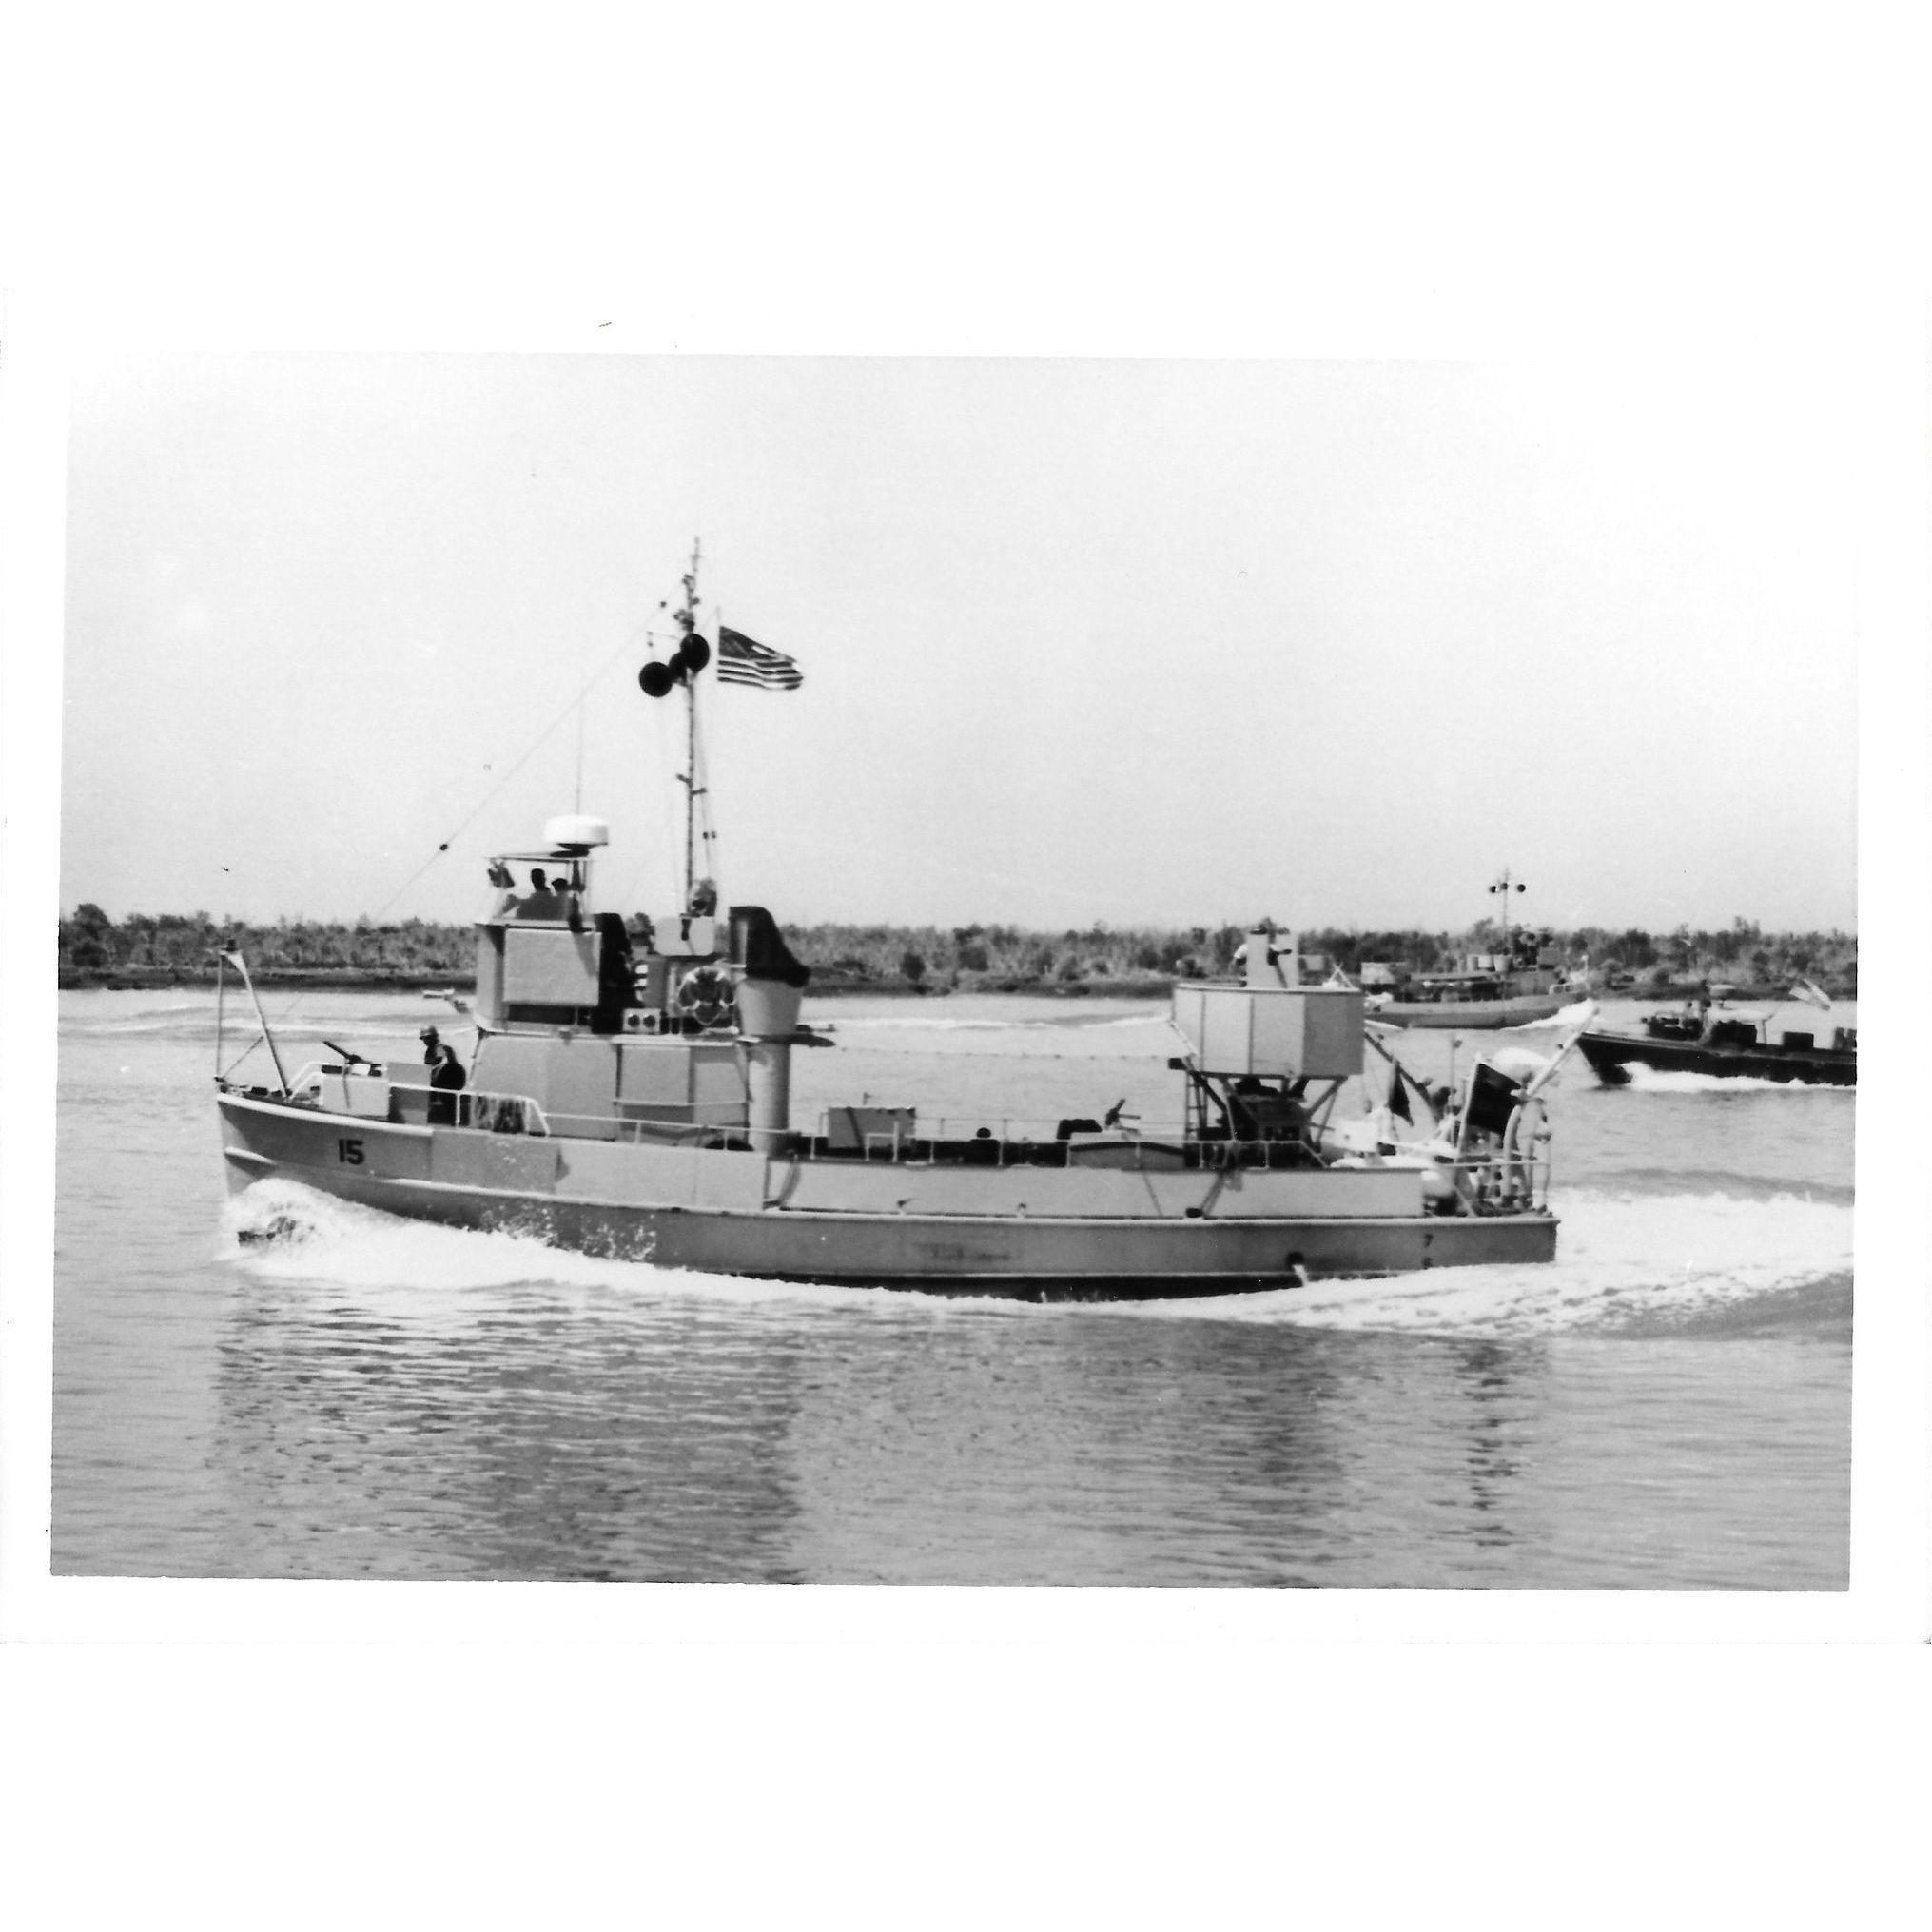 Vintage Photo Brown Water Navy Vietnam War Era Swift Boats Original Photograph